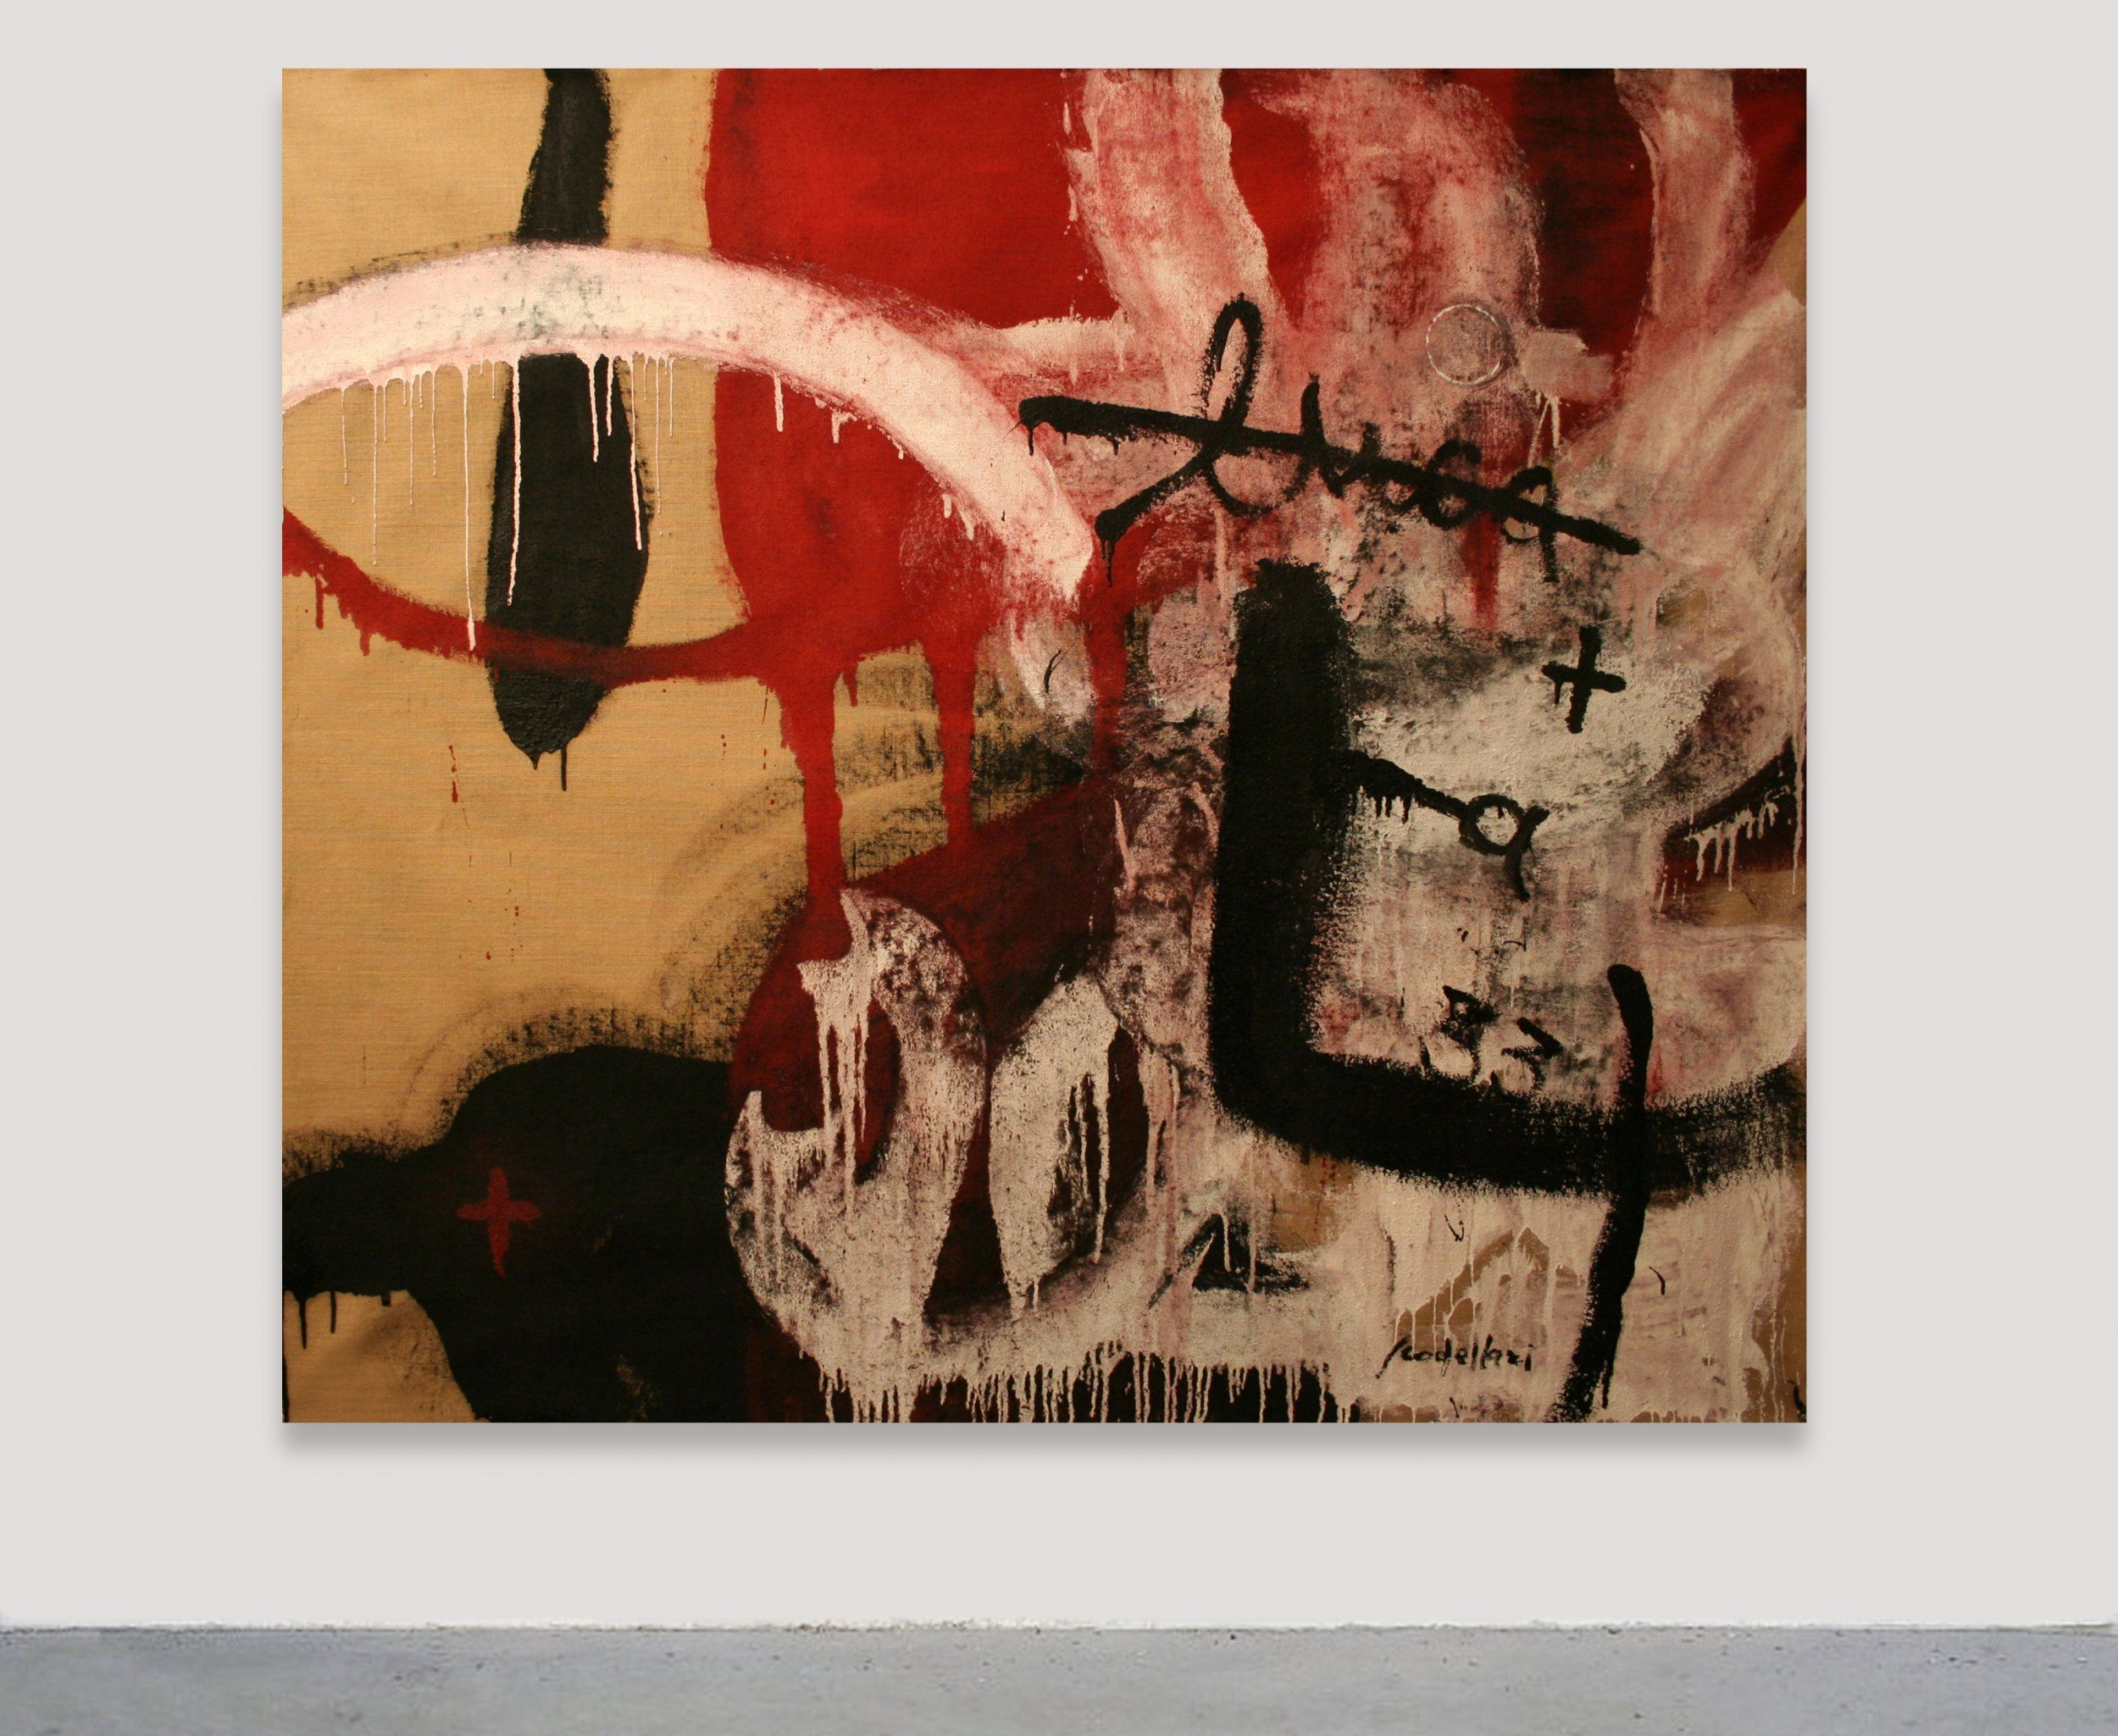 Luca Scodellari - Untitled  Painting, Abstract informal, Industrial paint / Glaze enamel, Canvas, 178x155cm, 2009